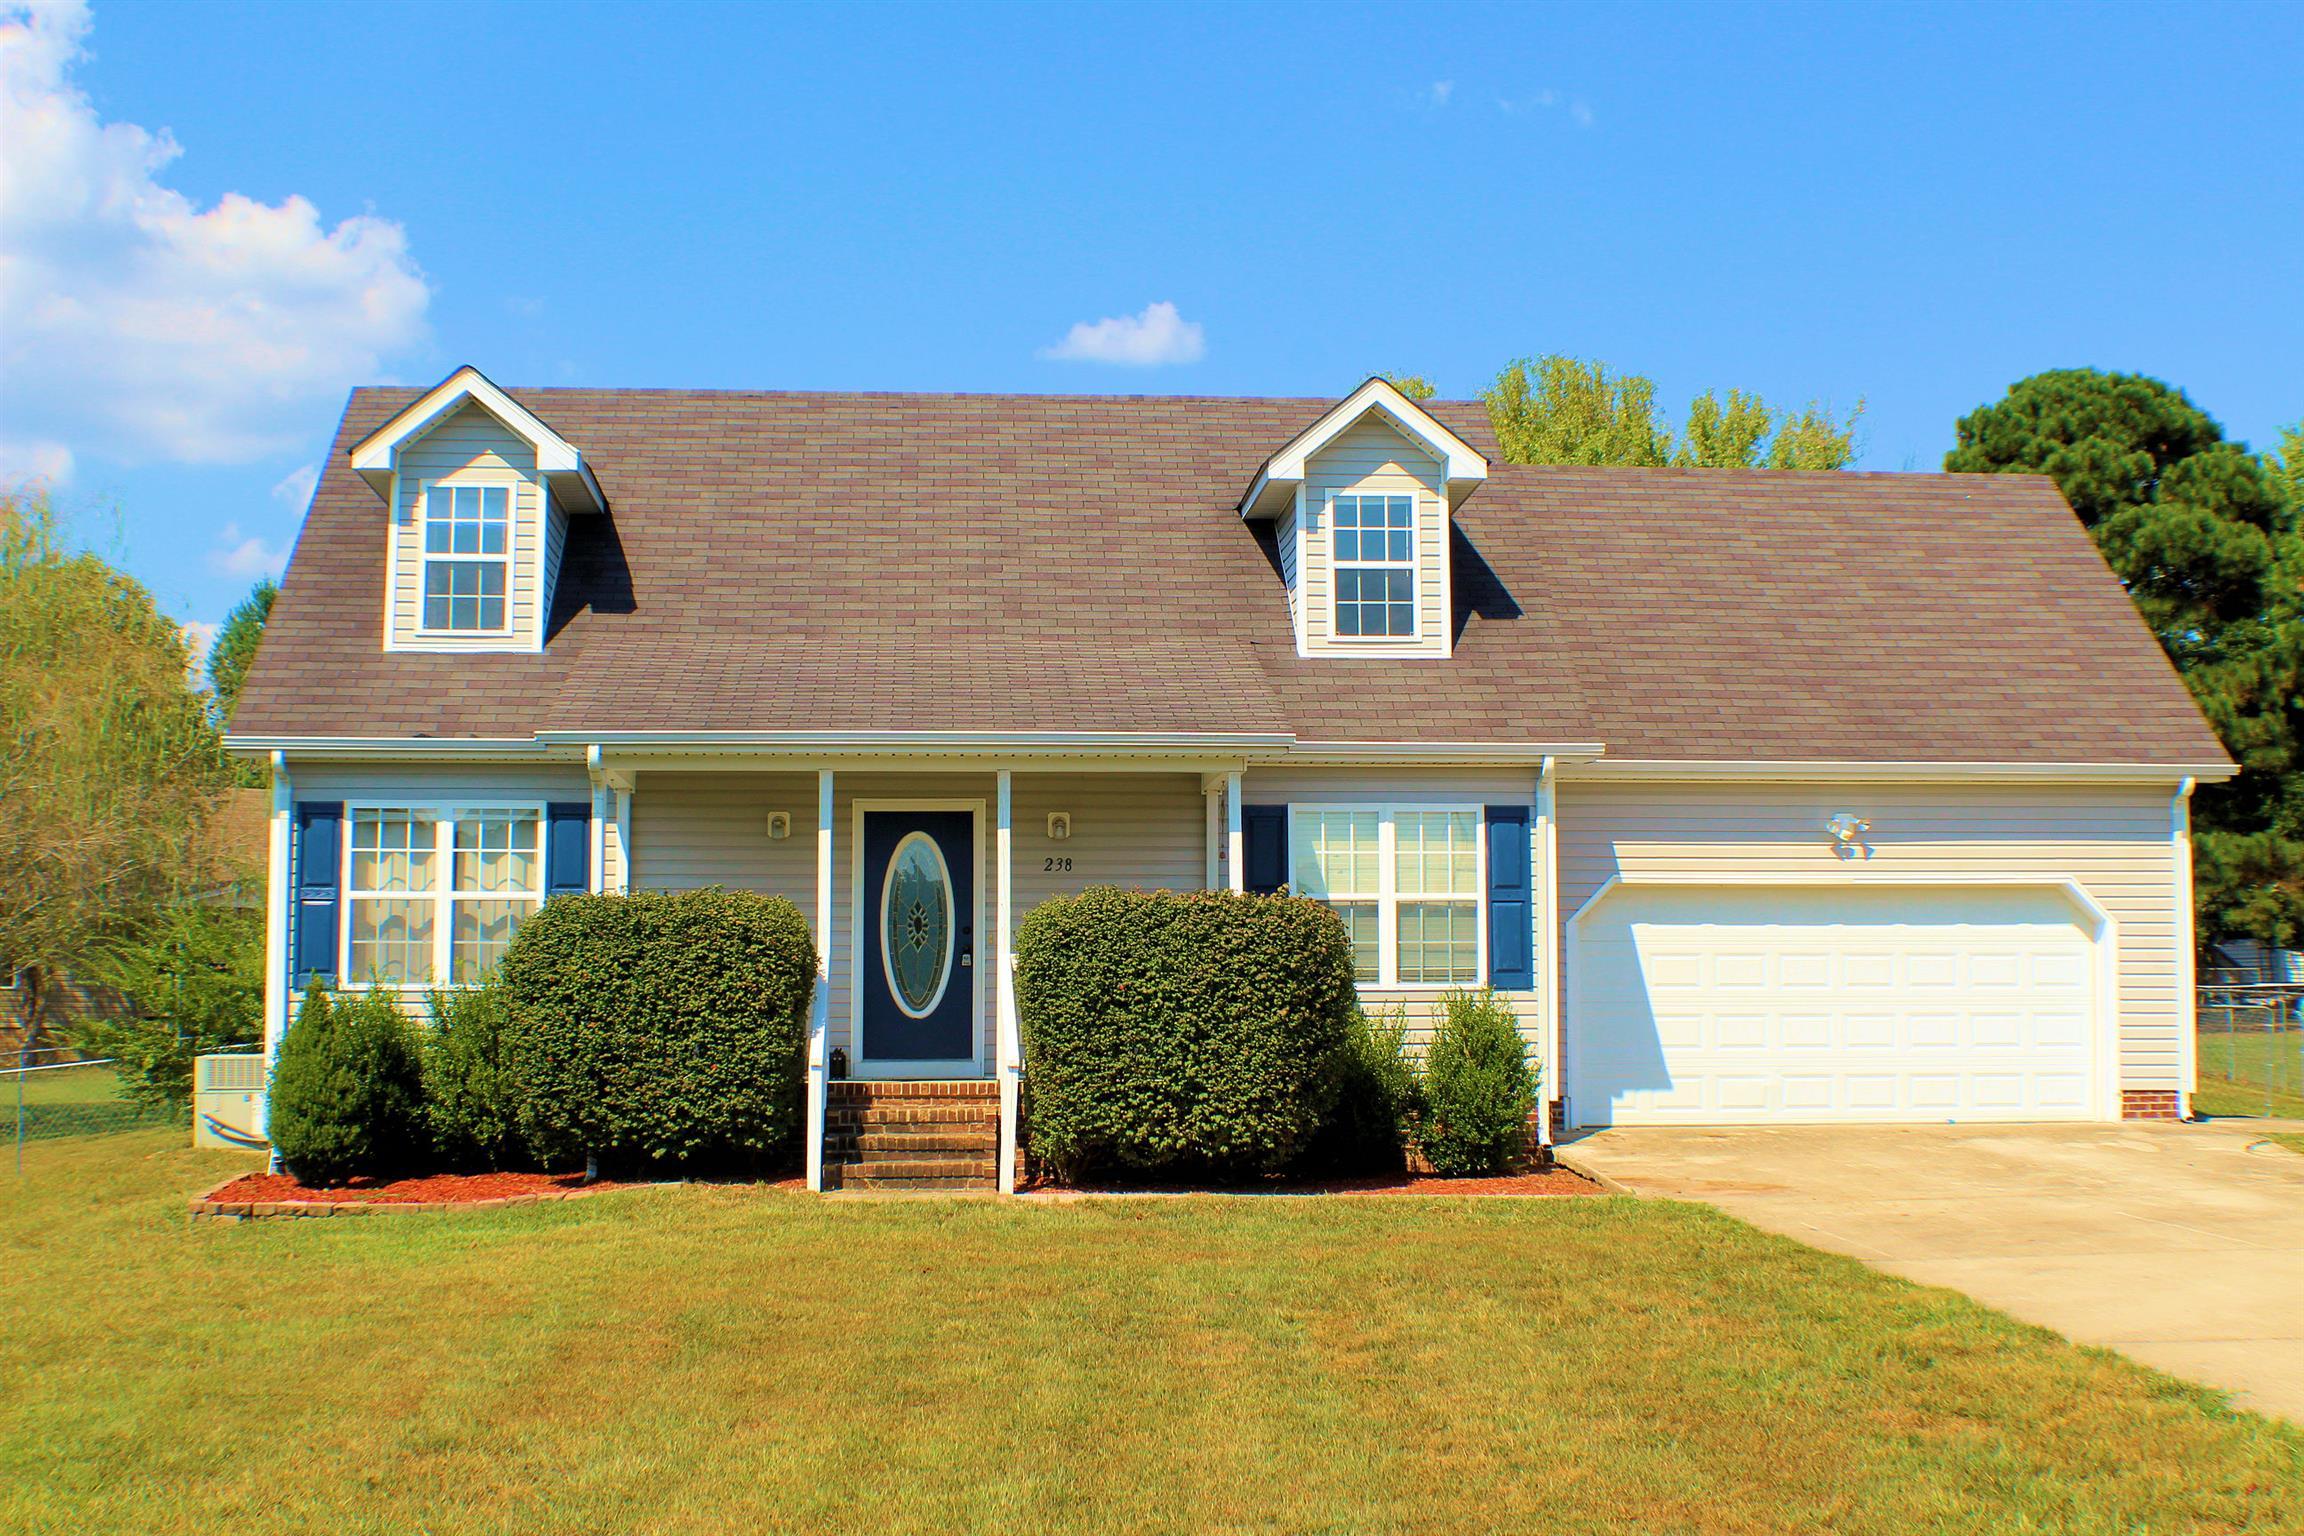 238 Williamsburg Cir, Tullahoma, TN 37388 - Tullahoma, TN real estate listing